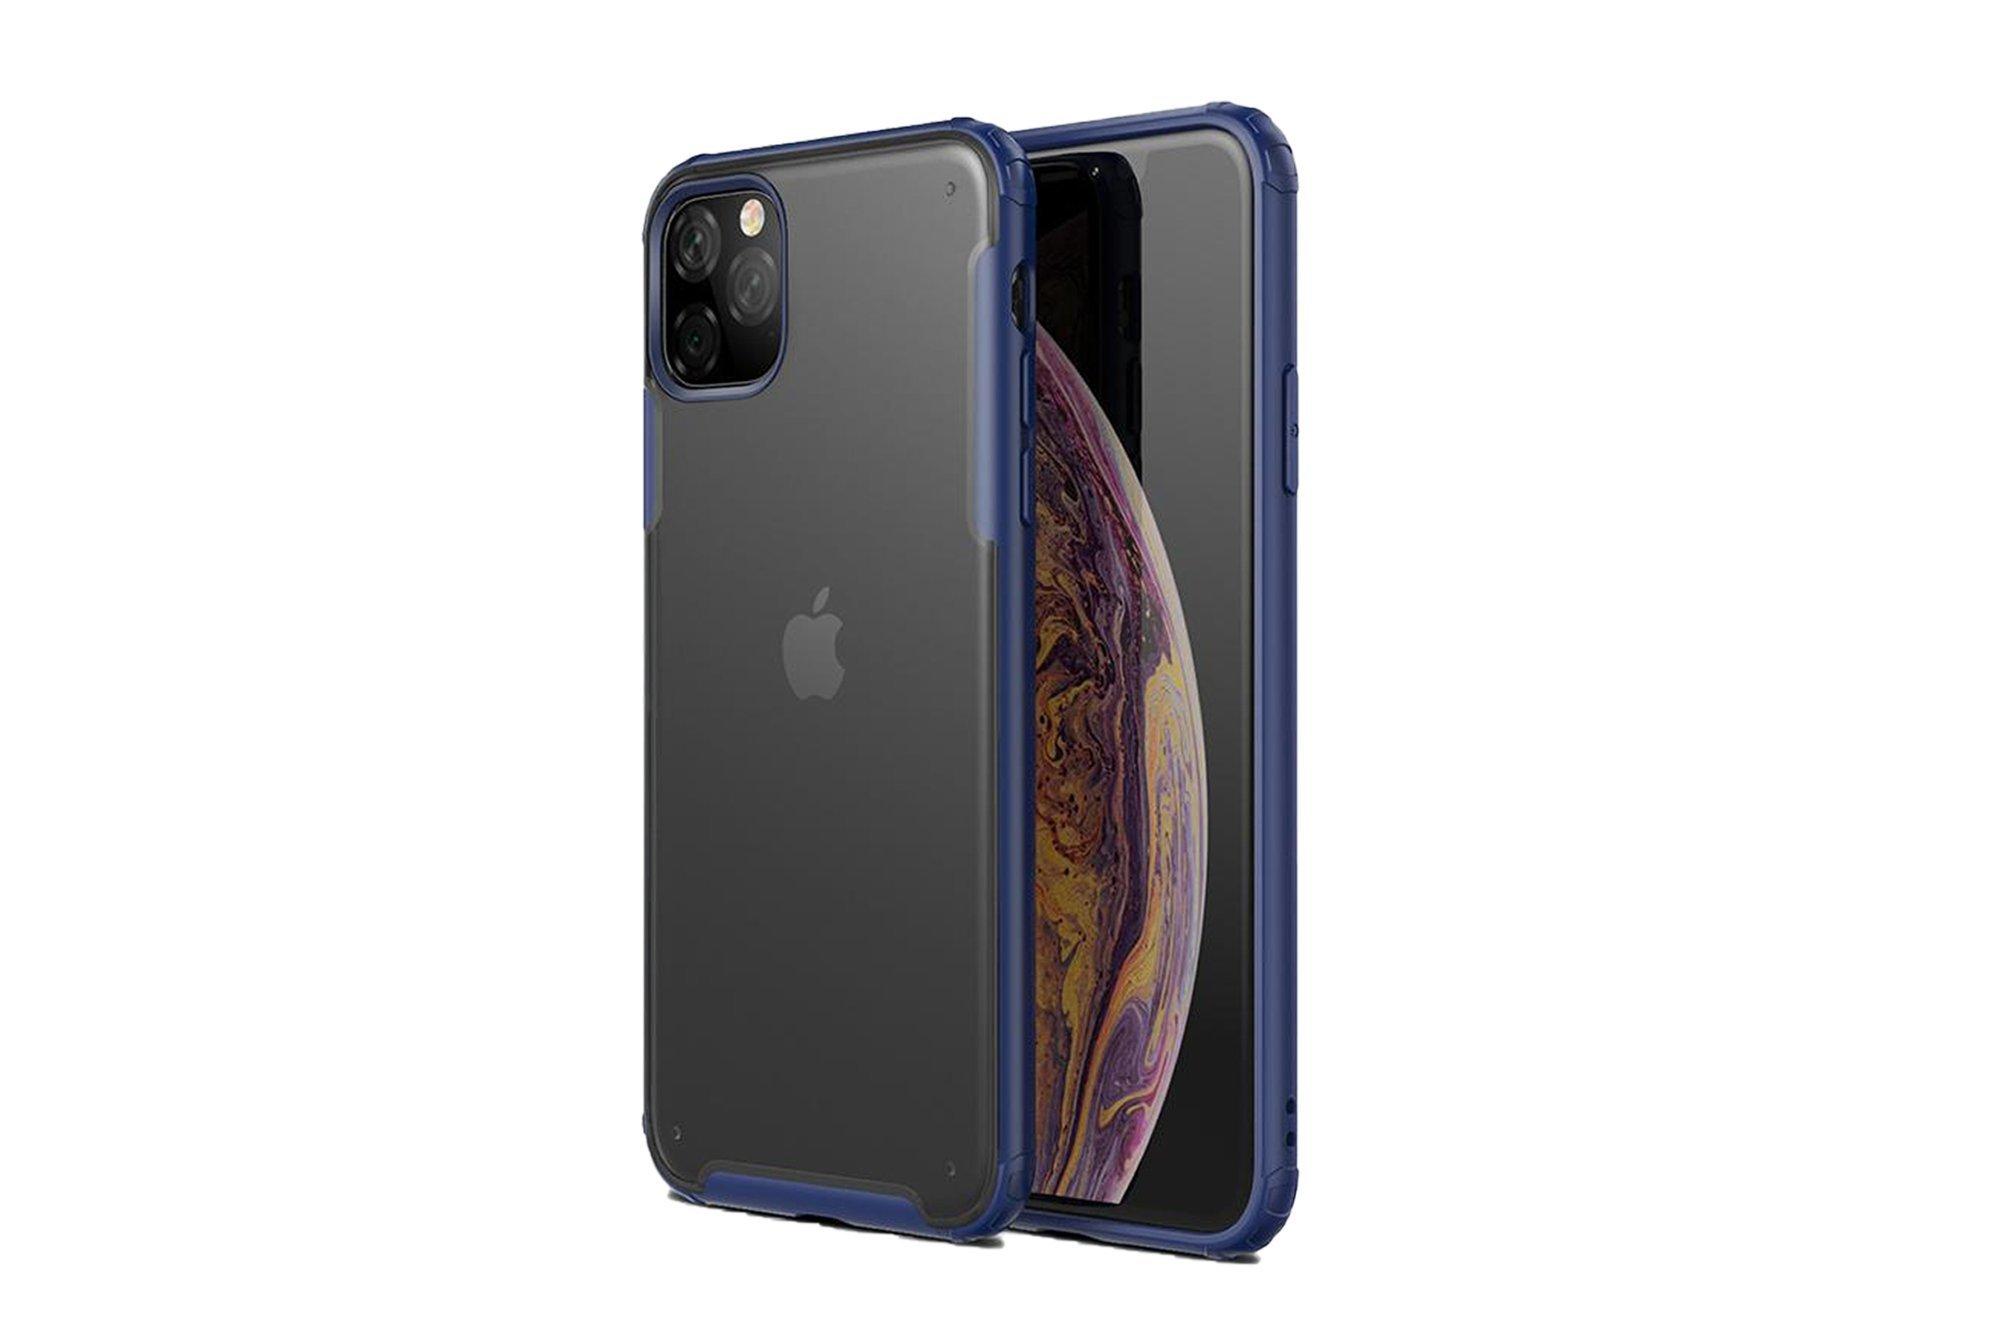 Transparent phone cover WLONS Apple iPhone 11 Blue